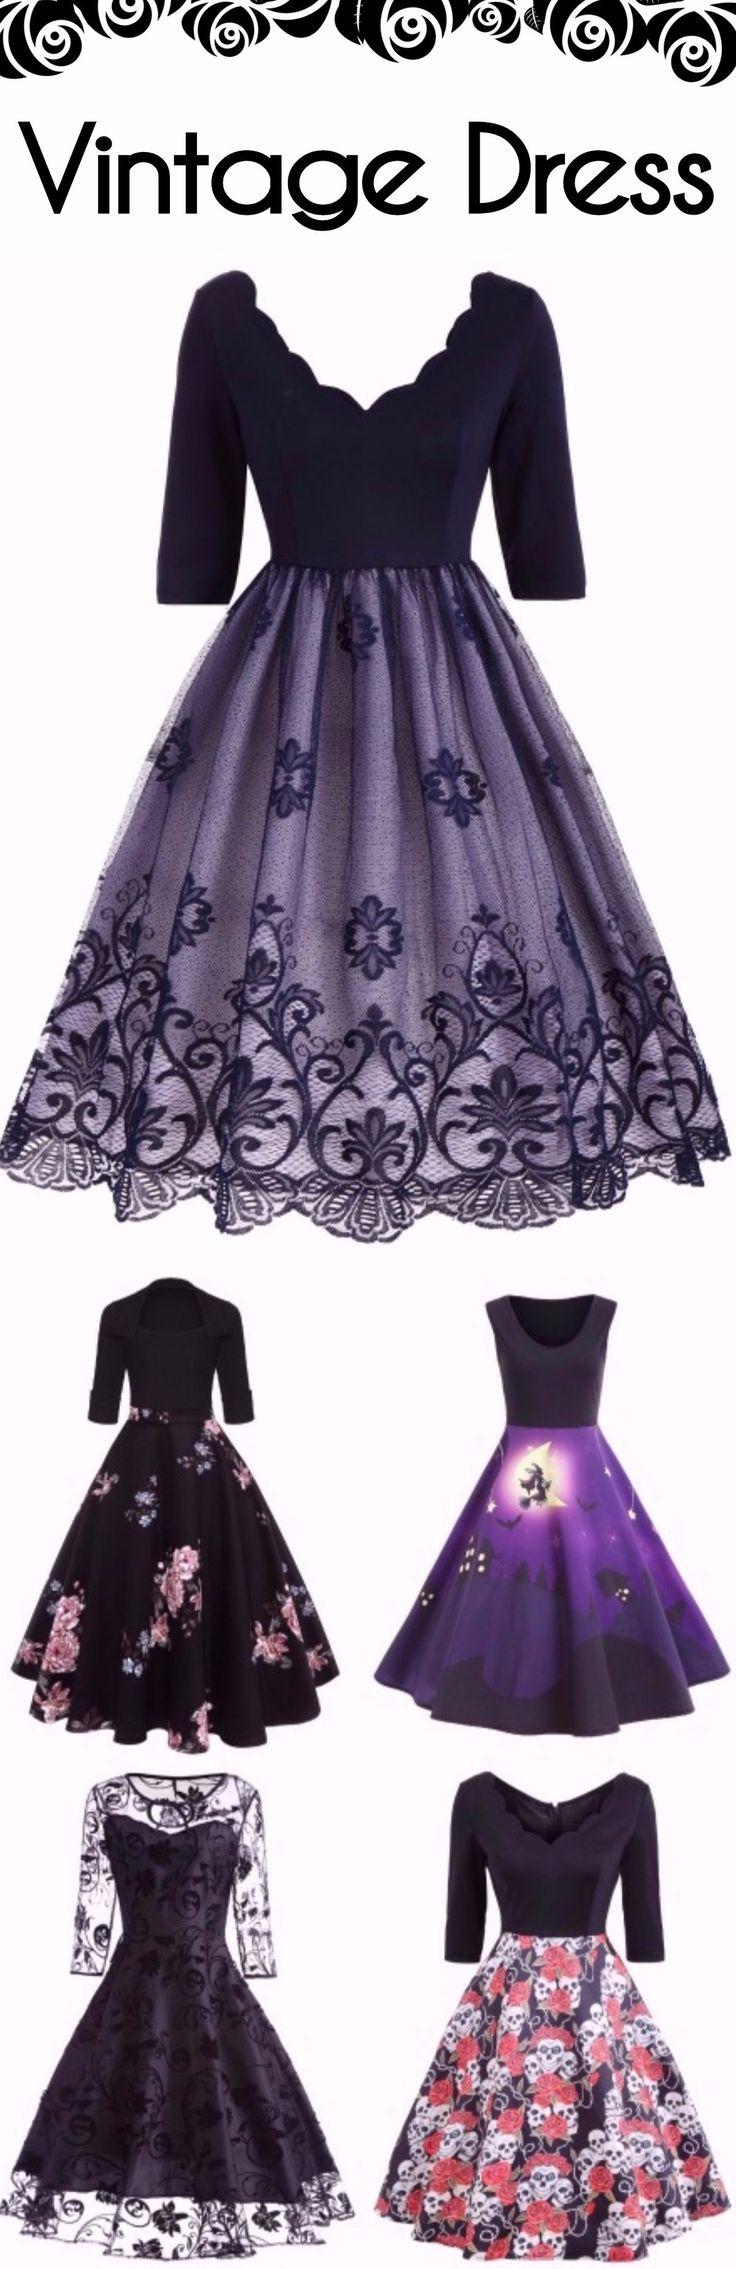 Party Vintage Dress | Start From Only $5.99 | Sammydress.com